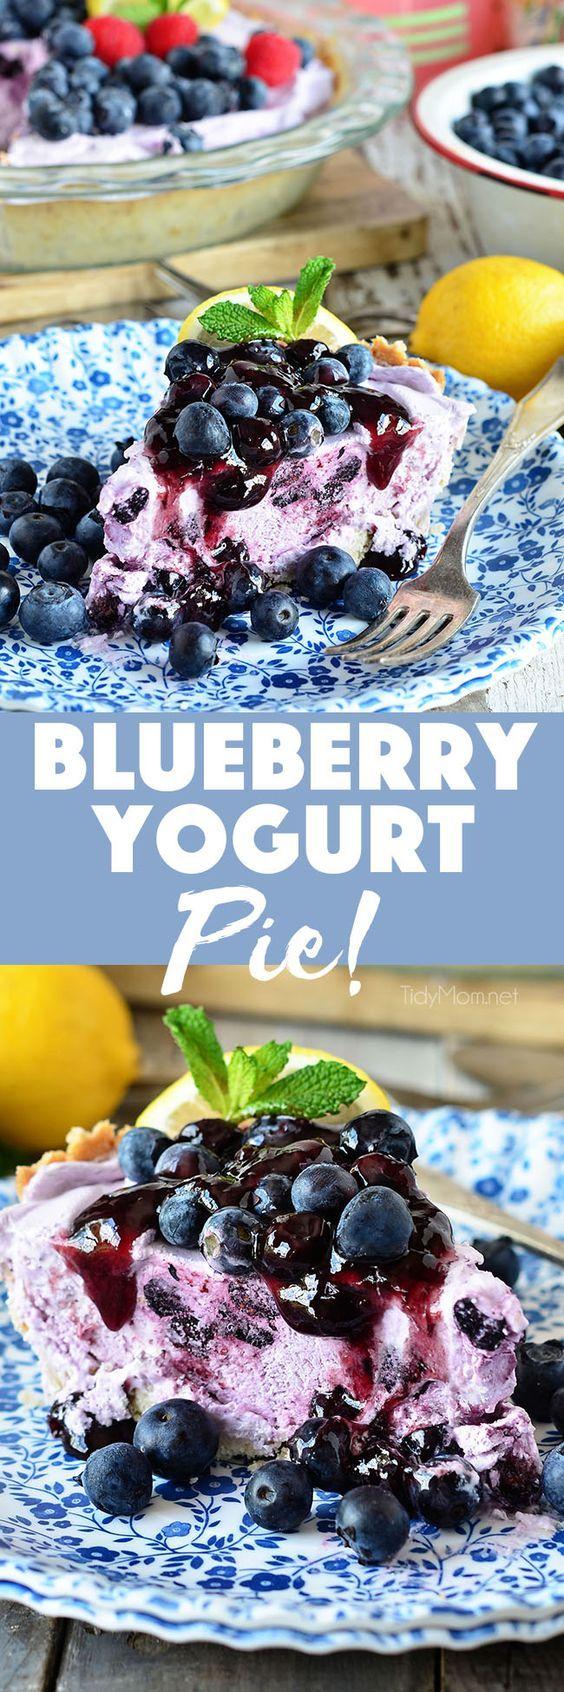 Yogurt pie, Blueberry fruit and Shortbread crust on Pinterest